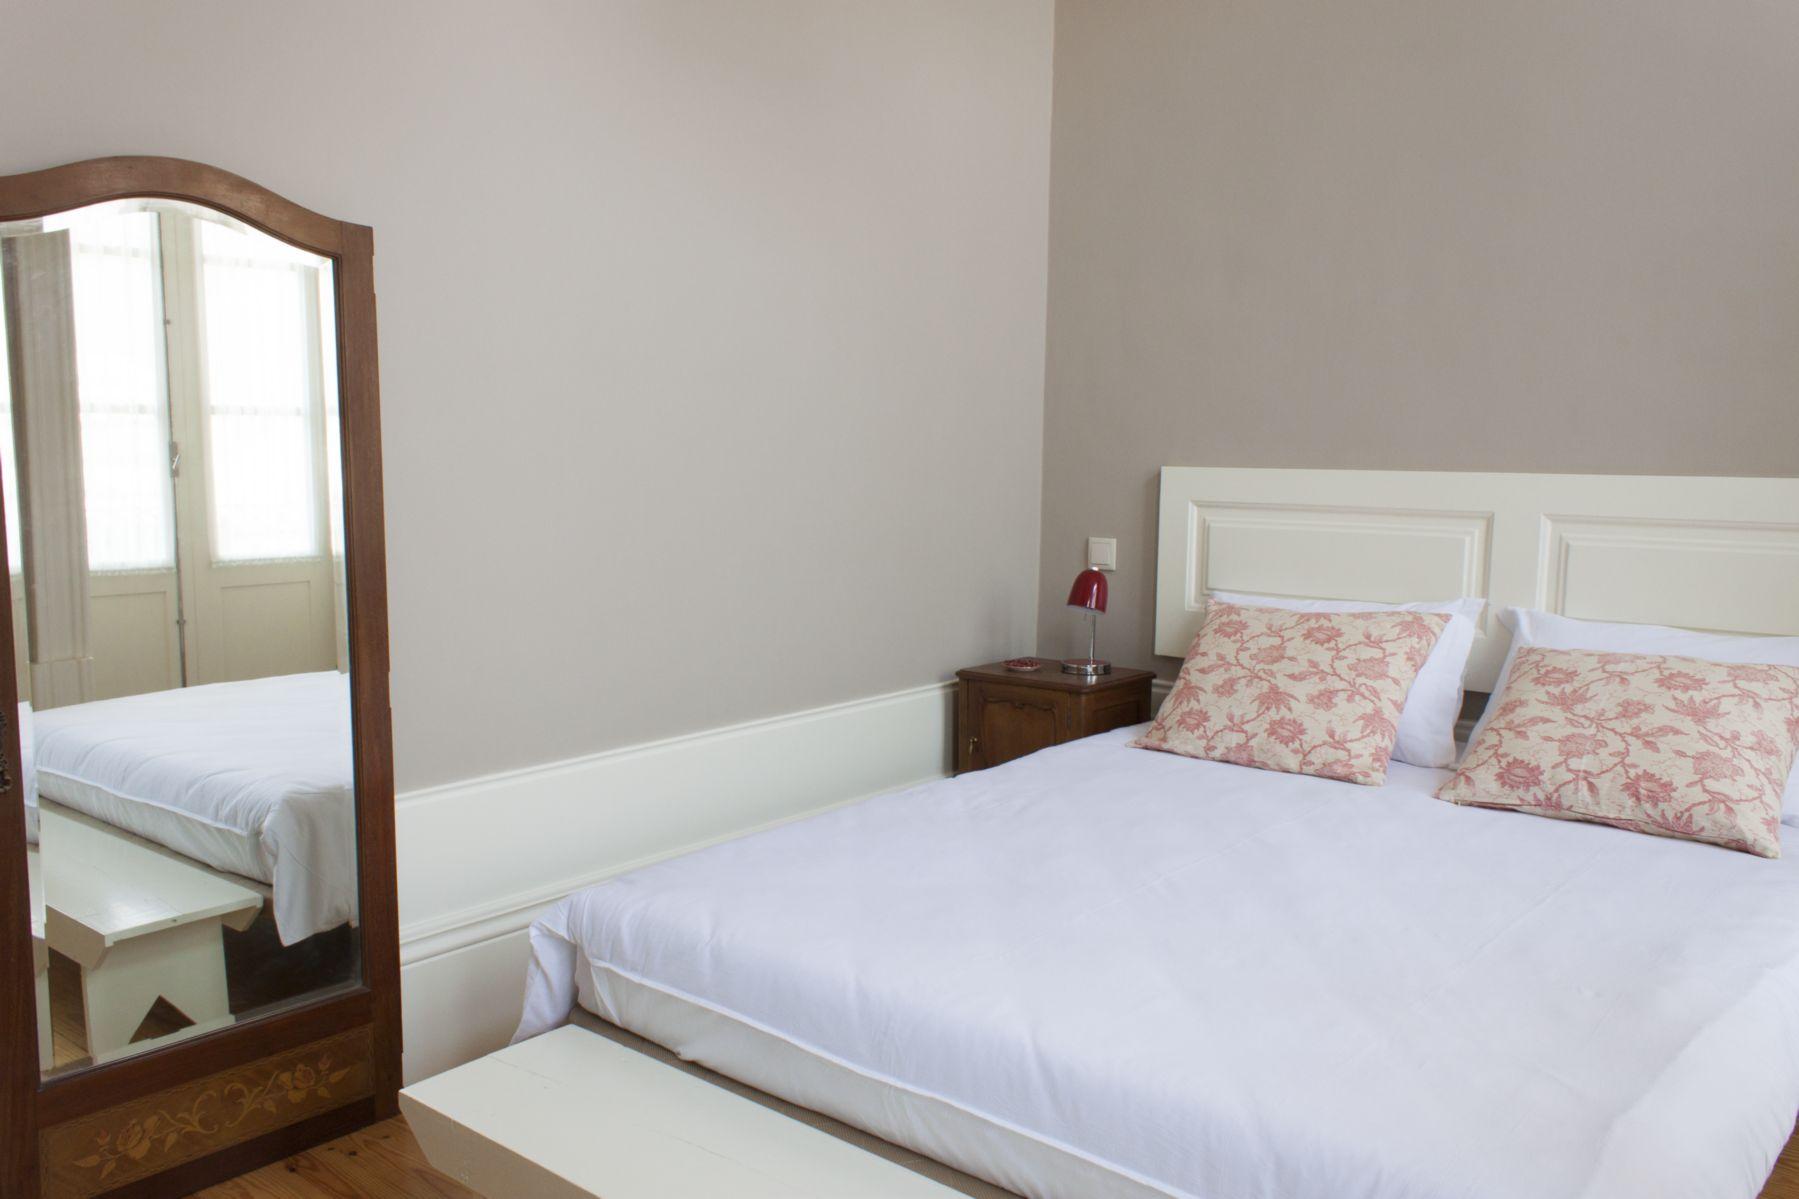 HOSTEL - Being Porto Hostel